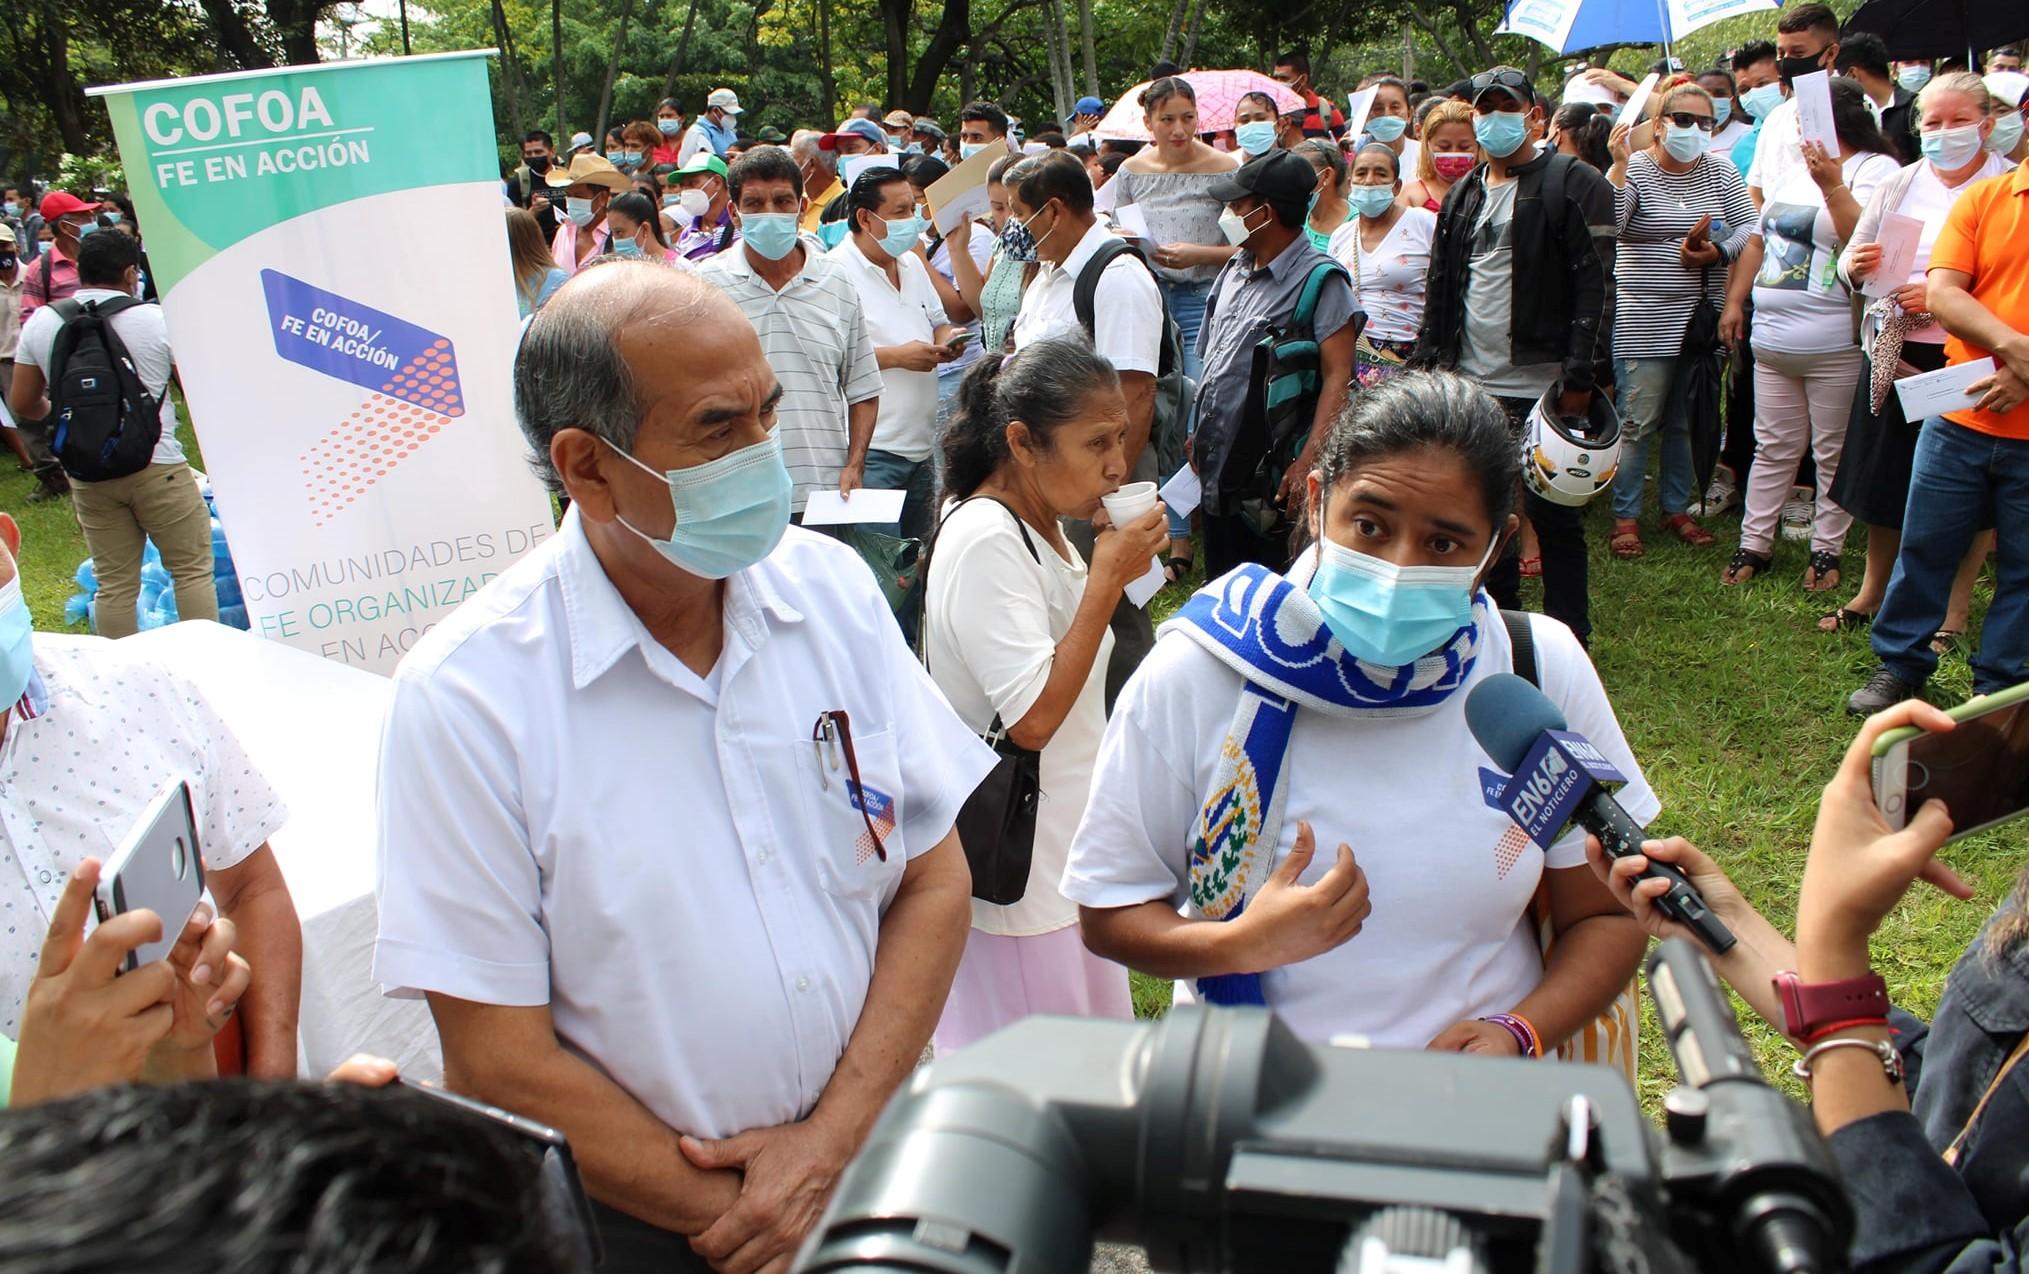 El Salvador: COFOA Is Gaining Traction As A National Organization